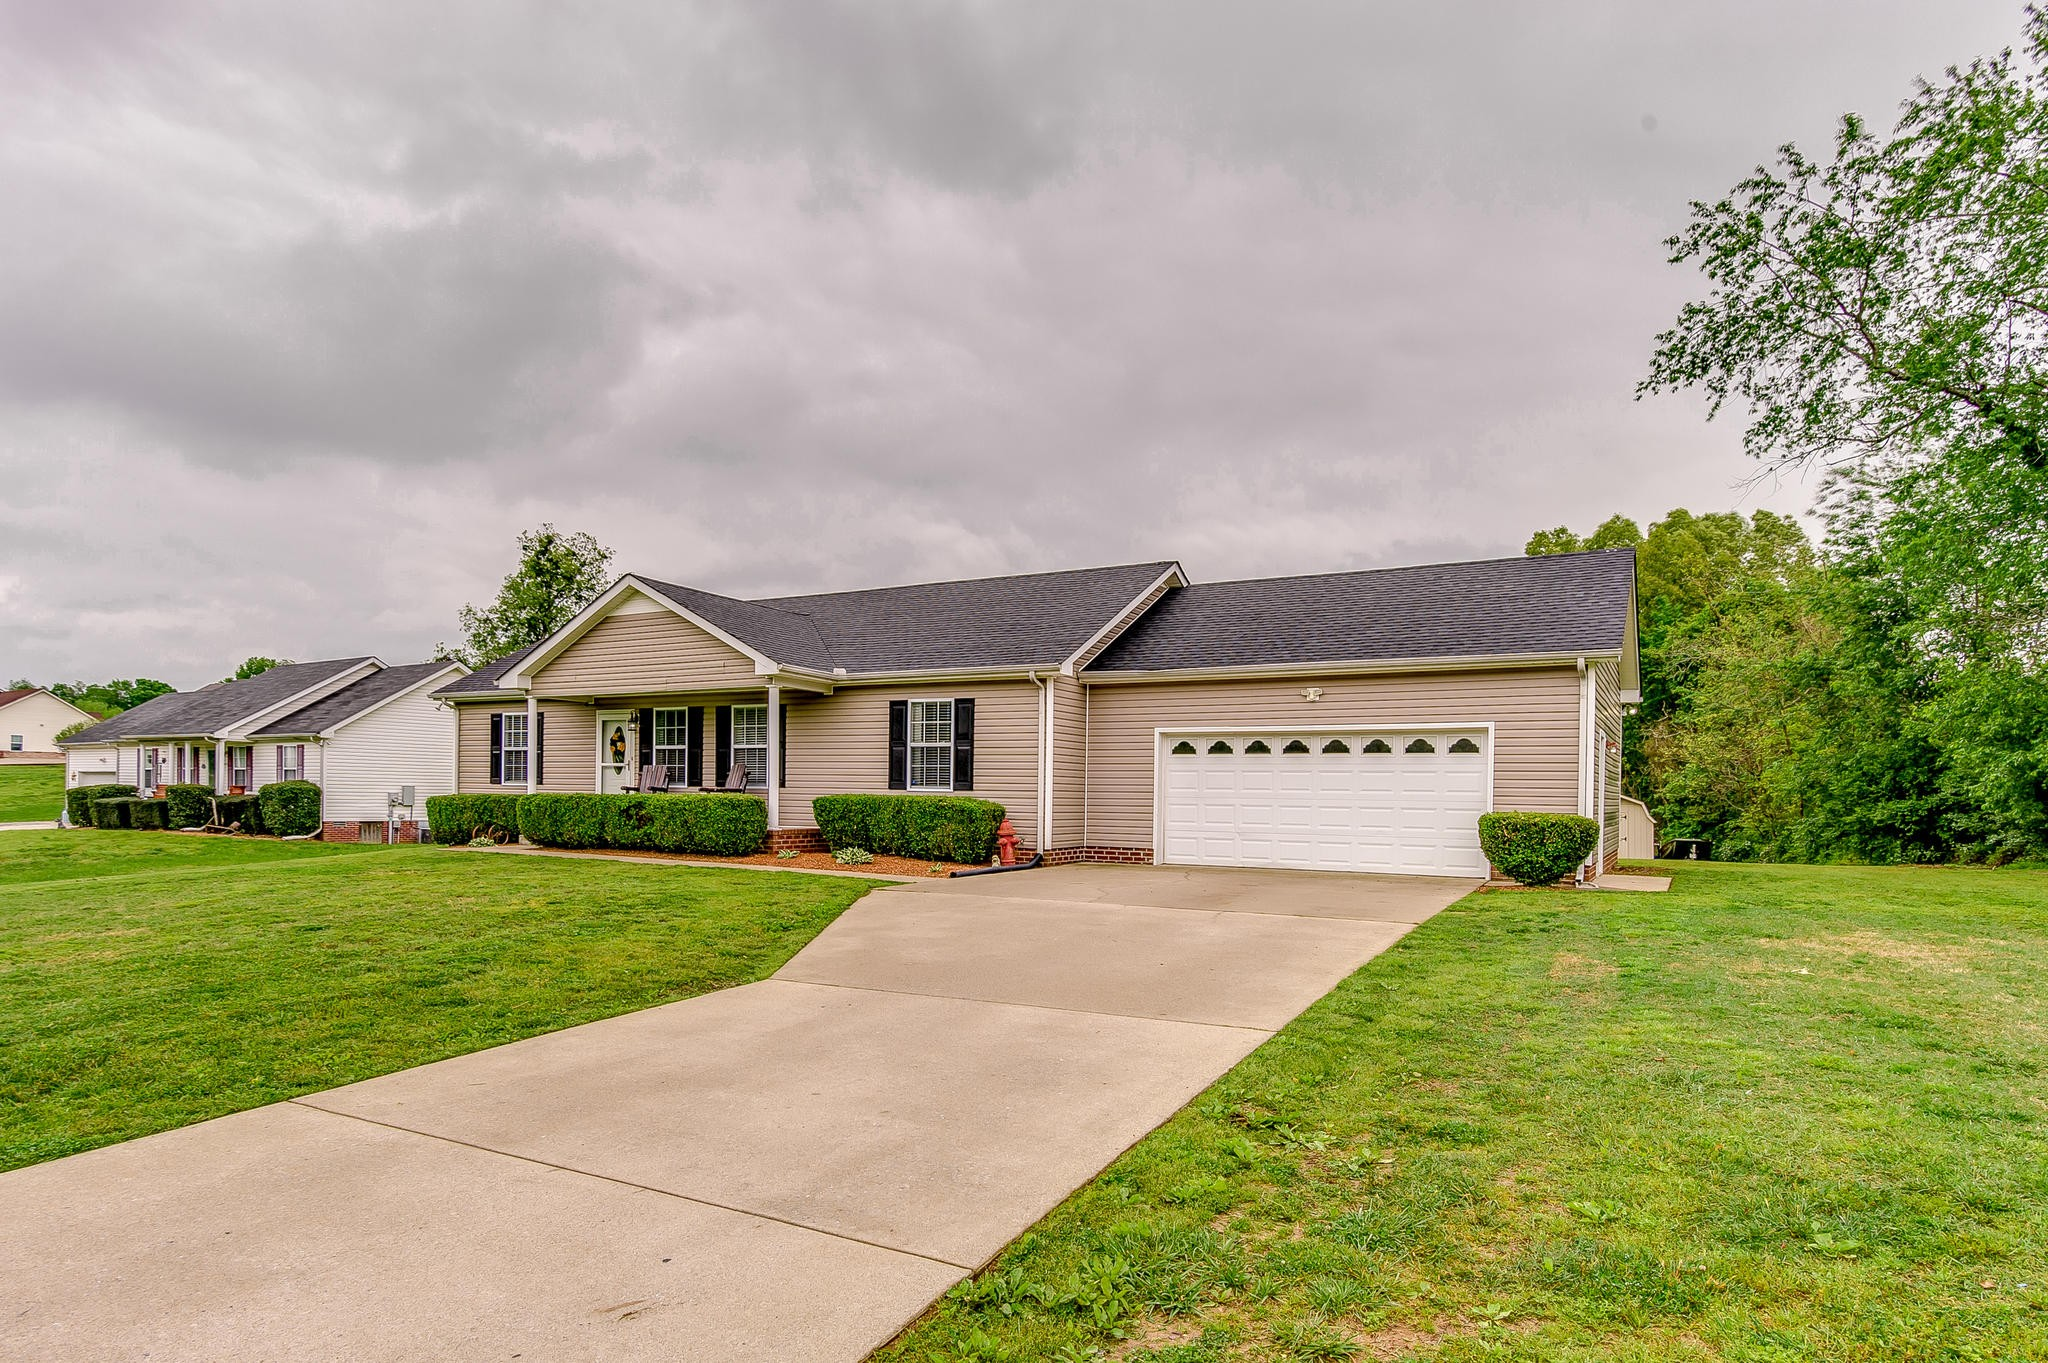 1065 Lillard Williams Rd, Chapmansboro, TN 37035 - Chapmansboro, TN real estate listing